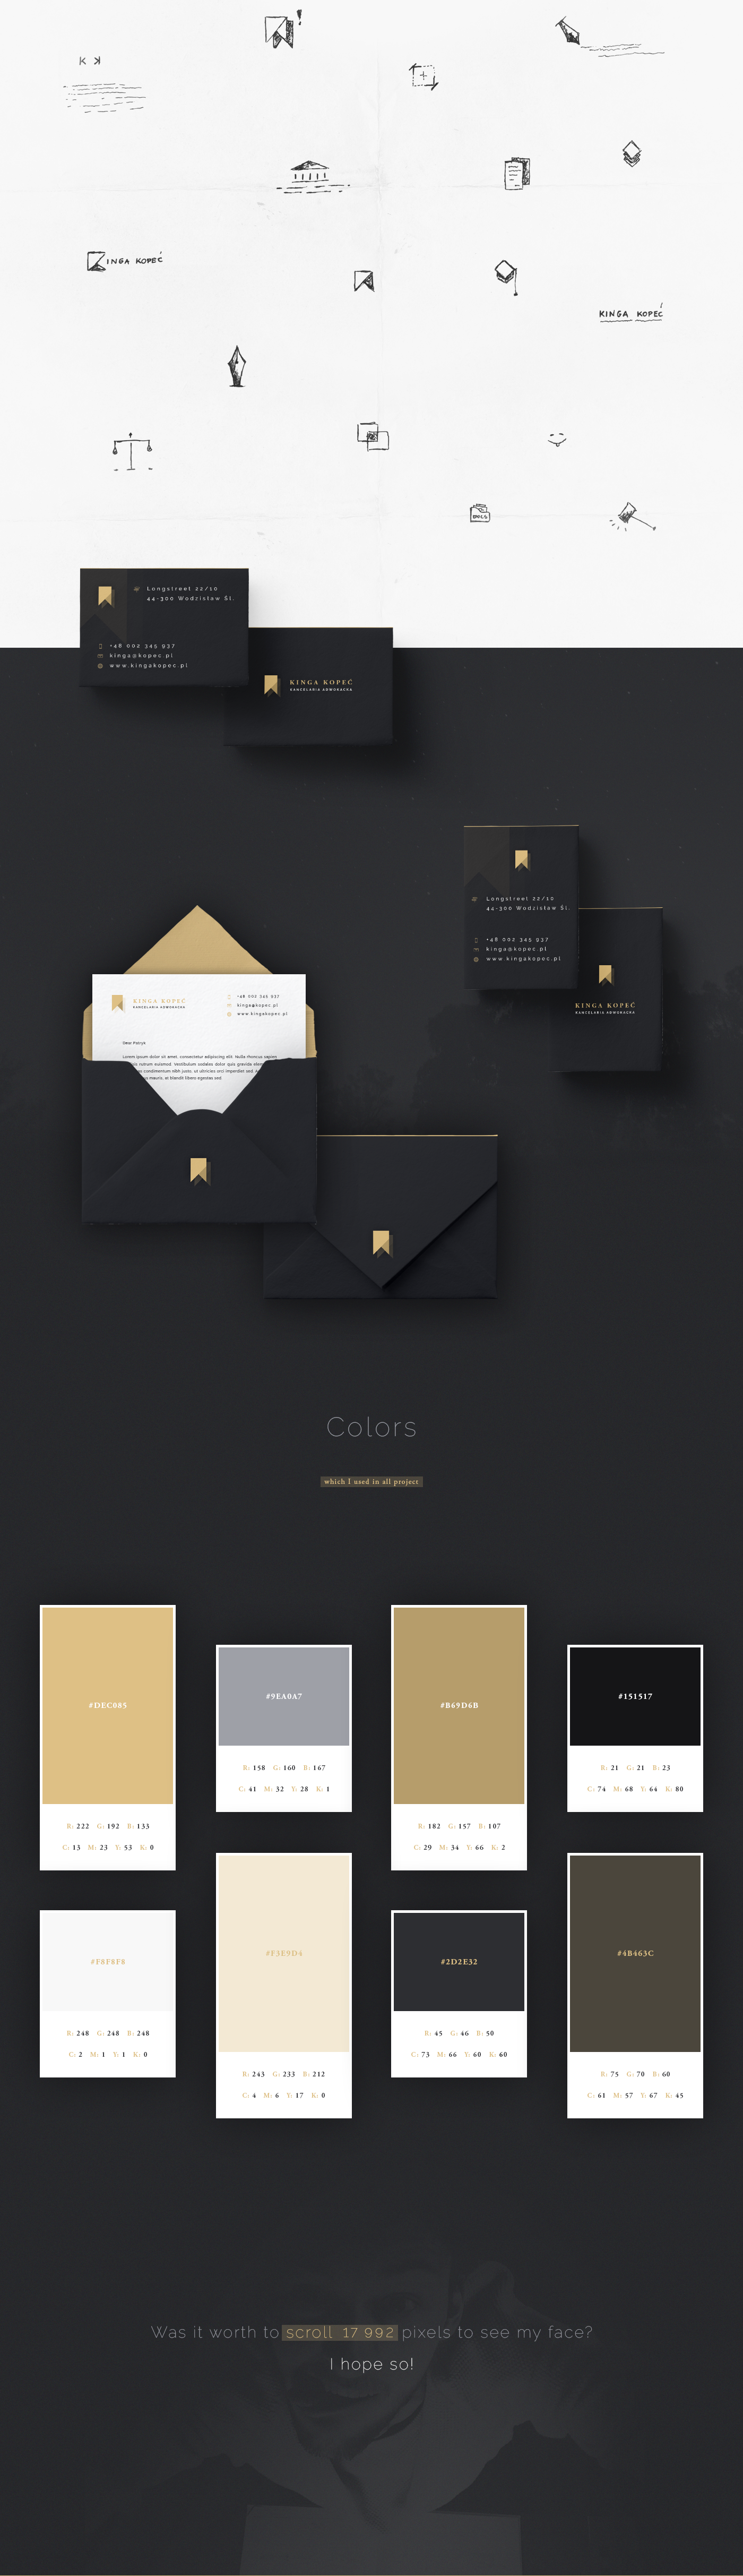 advocate Office kinga kopec Website design logo Business Cards envelope designer patryk kopec gold gray UI ux